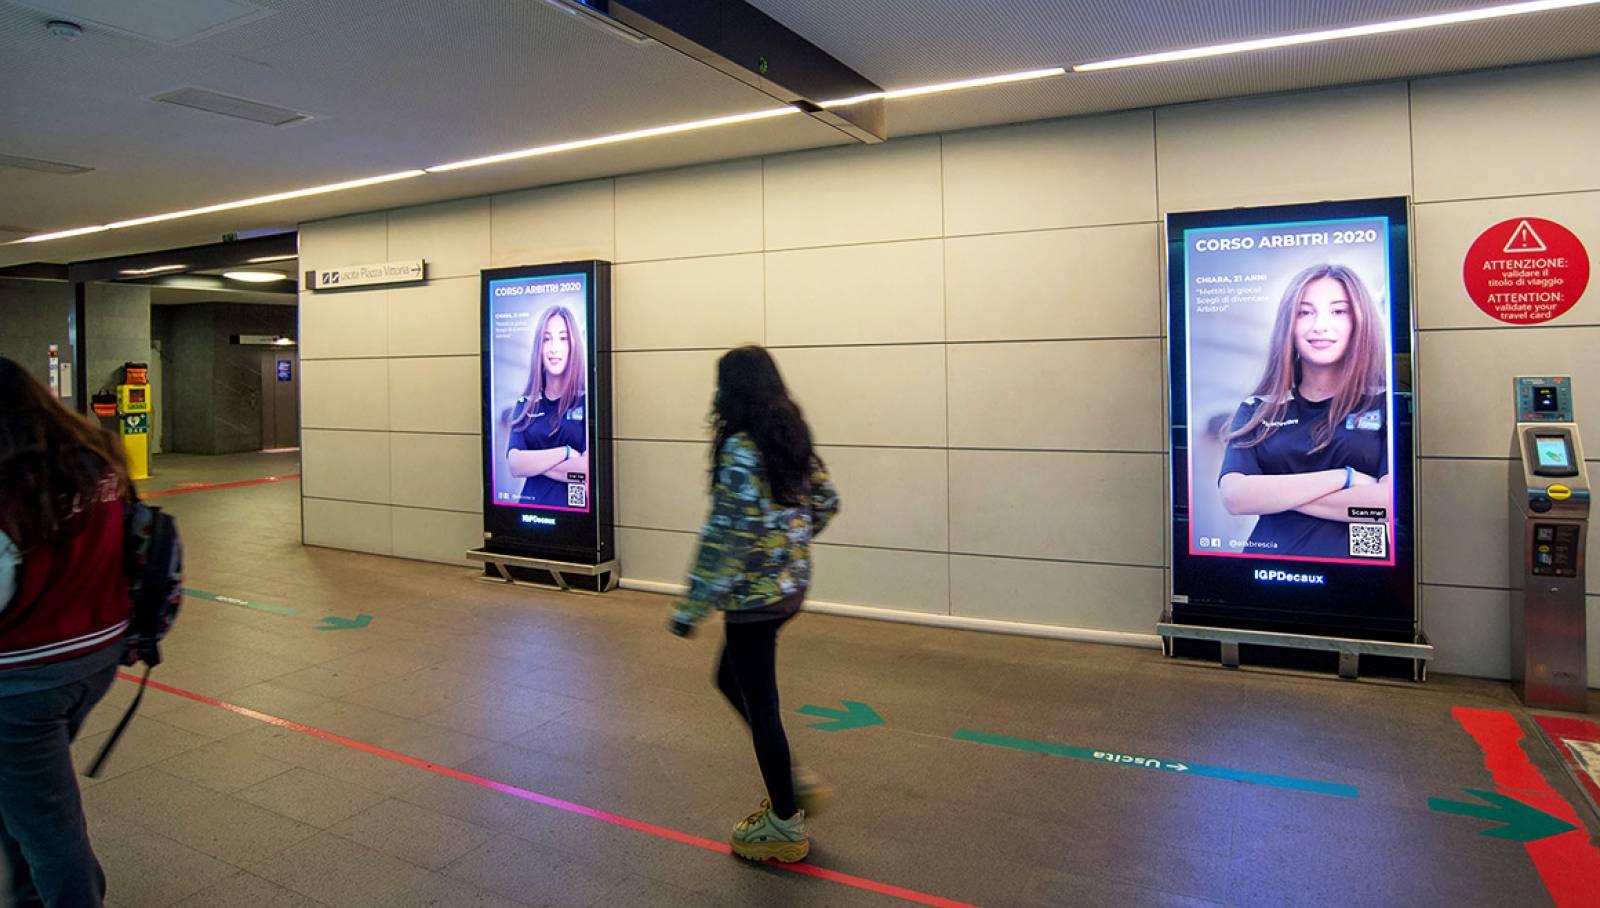 pubblicità in metropolitana a Brescia Network Vision IGPDecaux